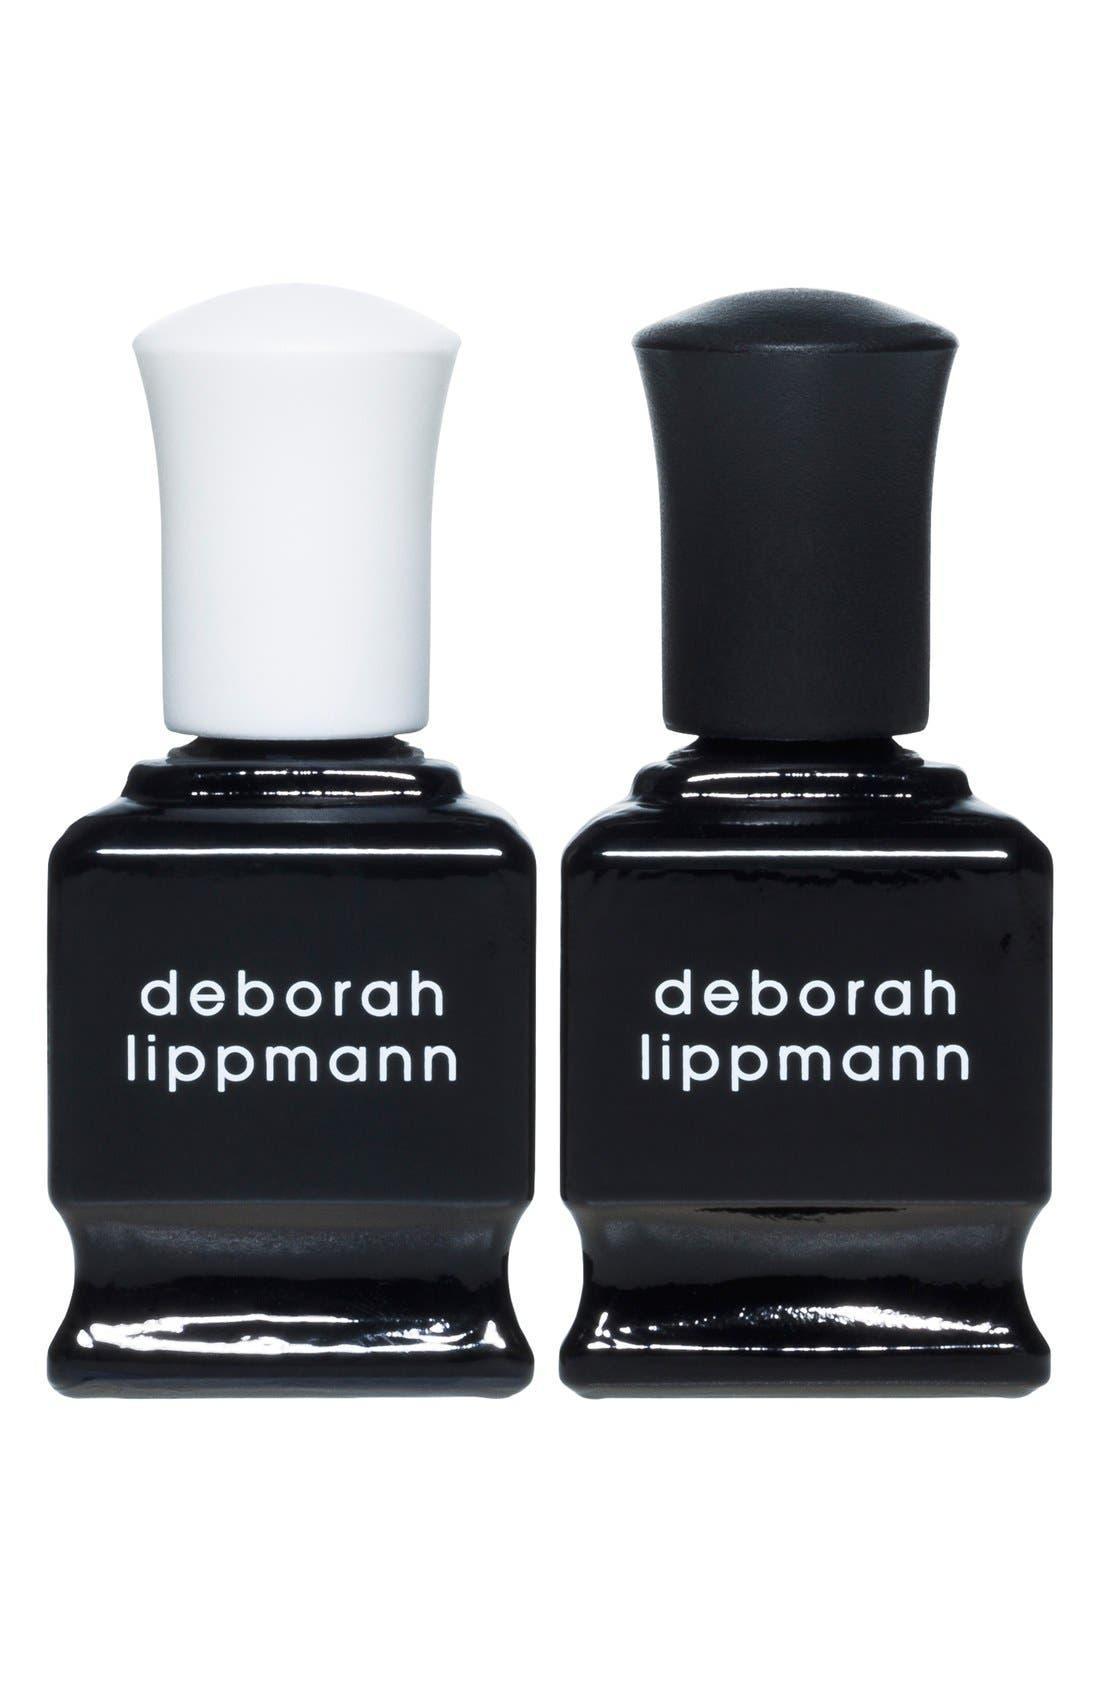 Deborah Lippmann 'Gel Lab Pro' Duo